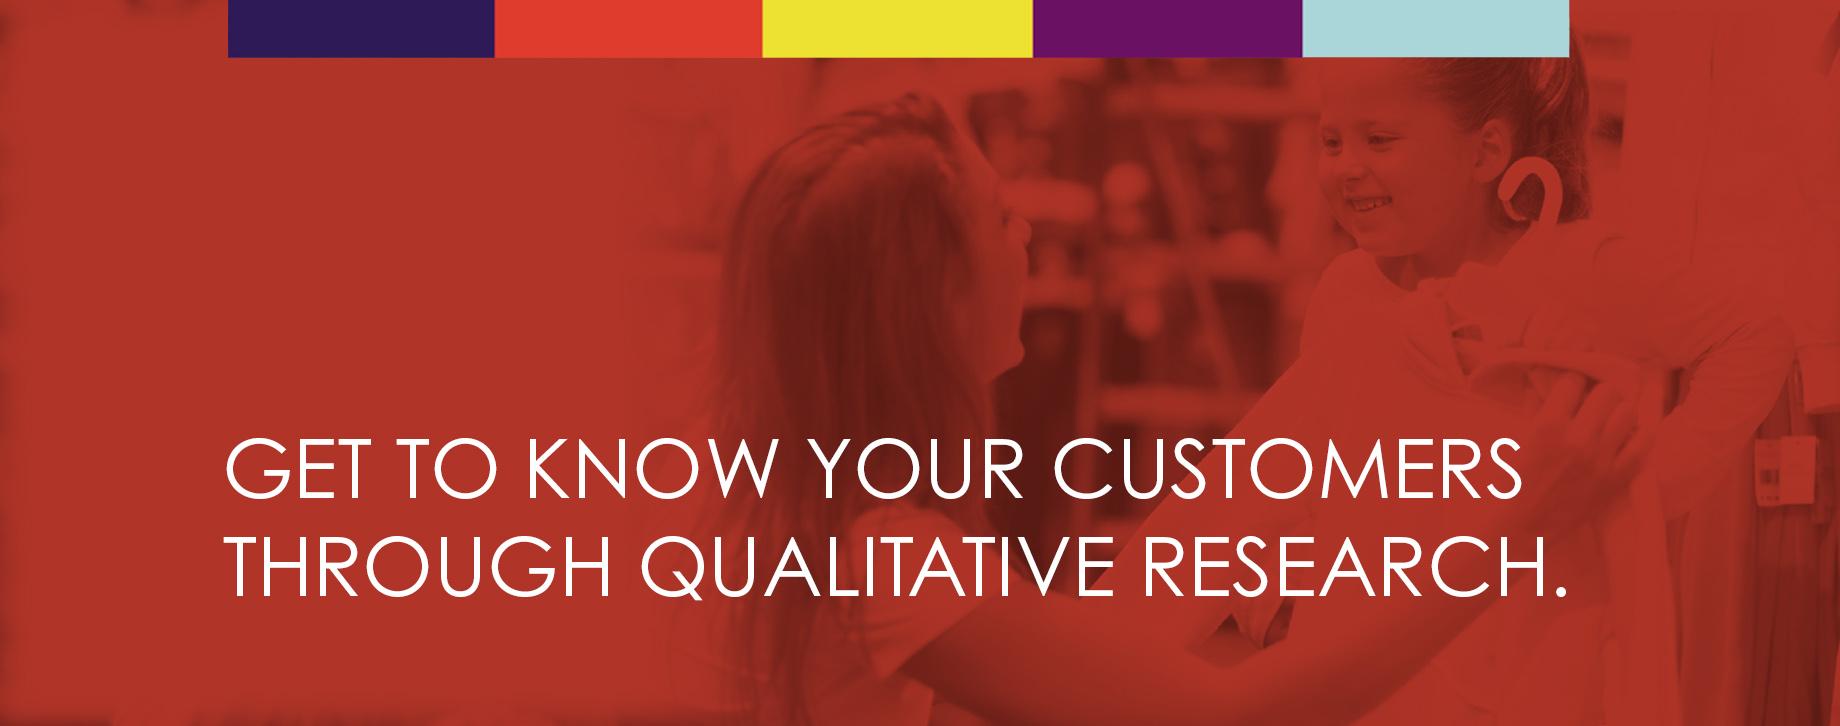 Clift Focus Group Moderator - Qualitative Research 01.jpg